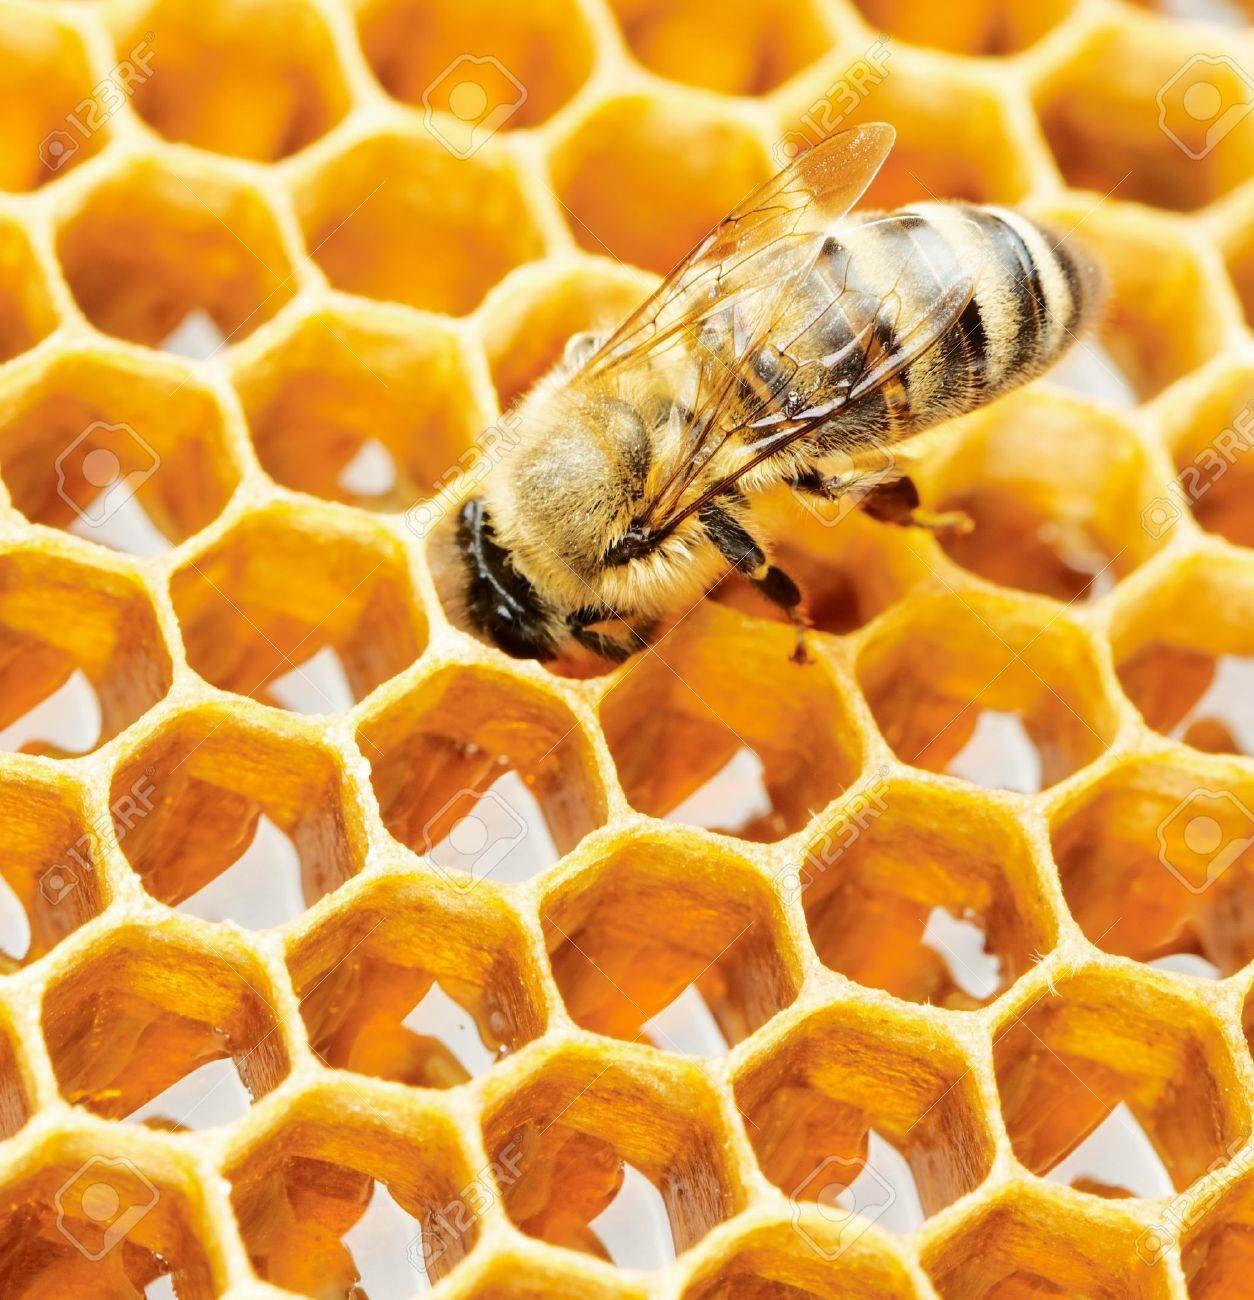 Honeycomb in Acacia Honey 340g - £4.35 in ALDI